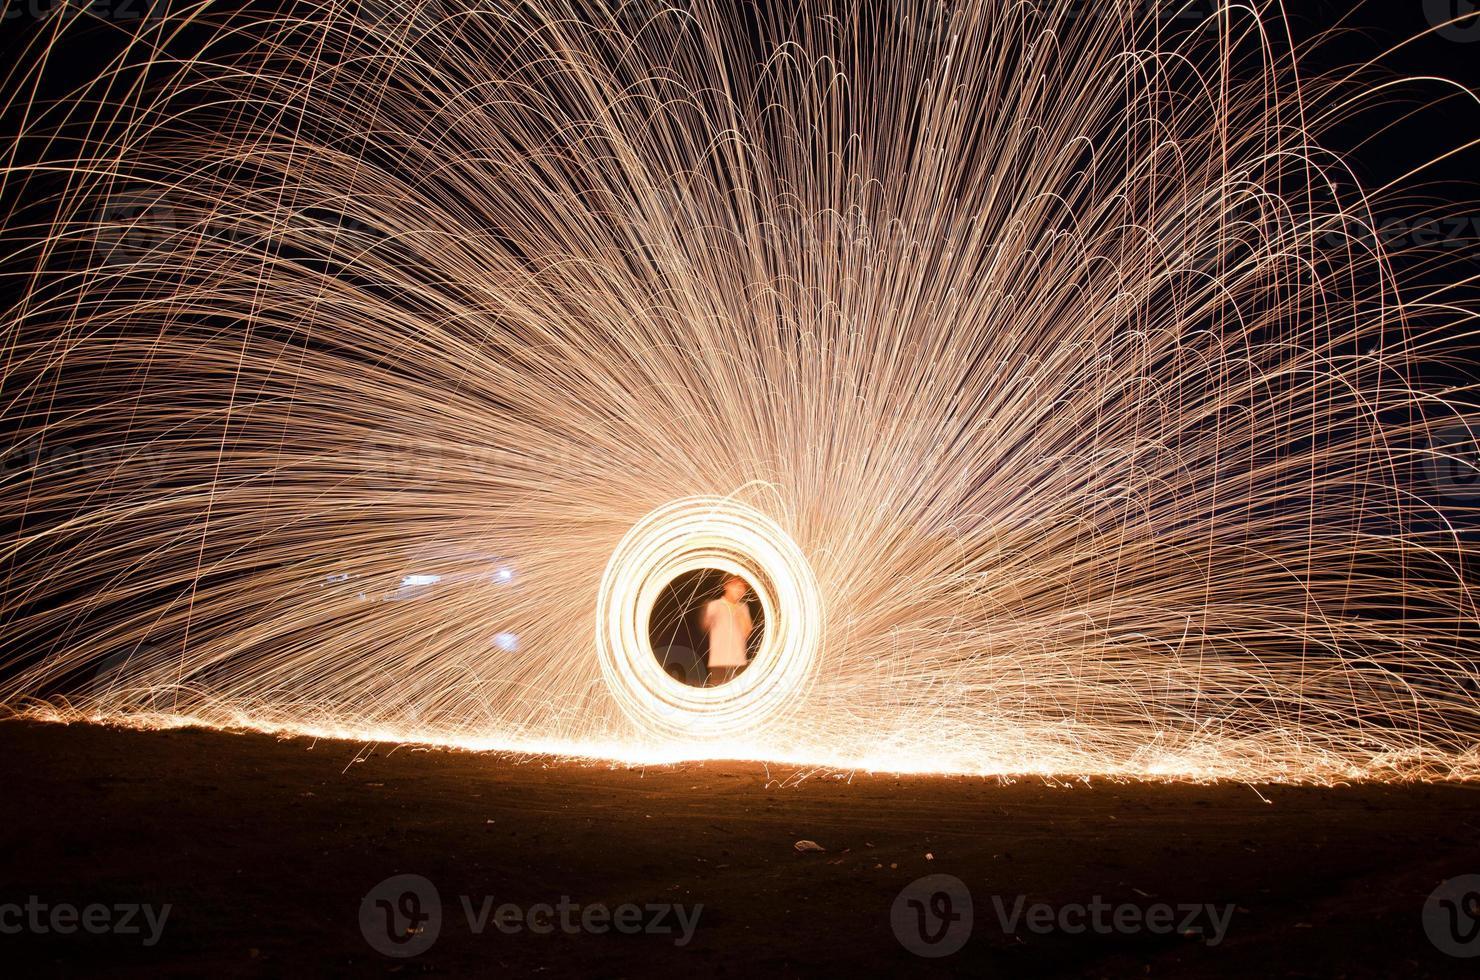 Burning steel wool fireworks photo